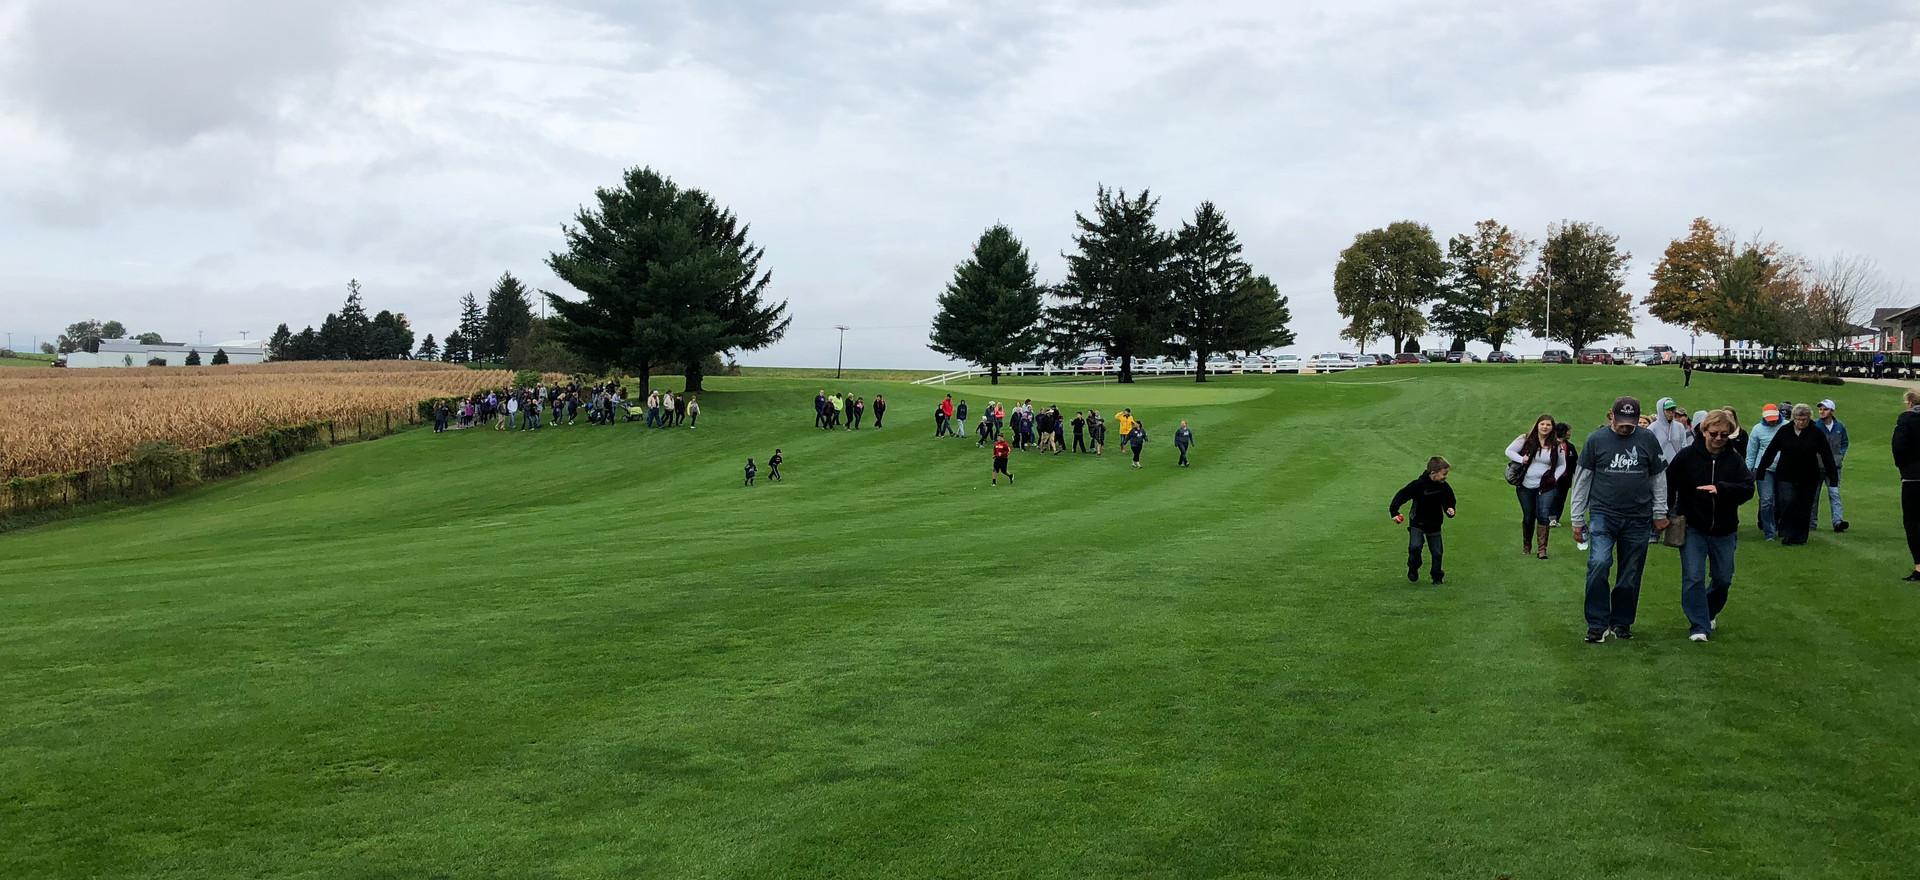 2018 Walk and Golf Tournament